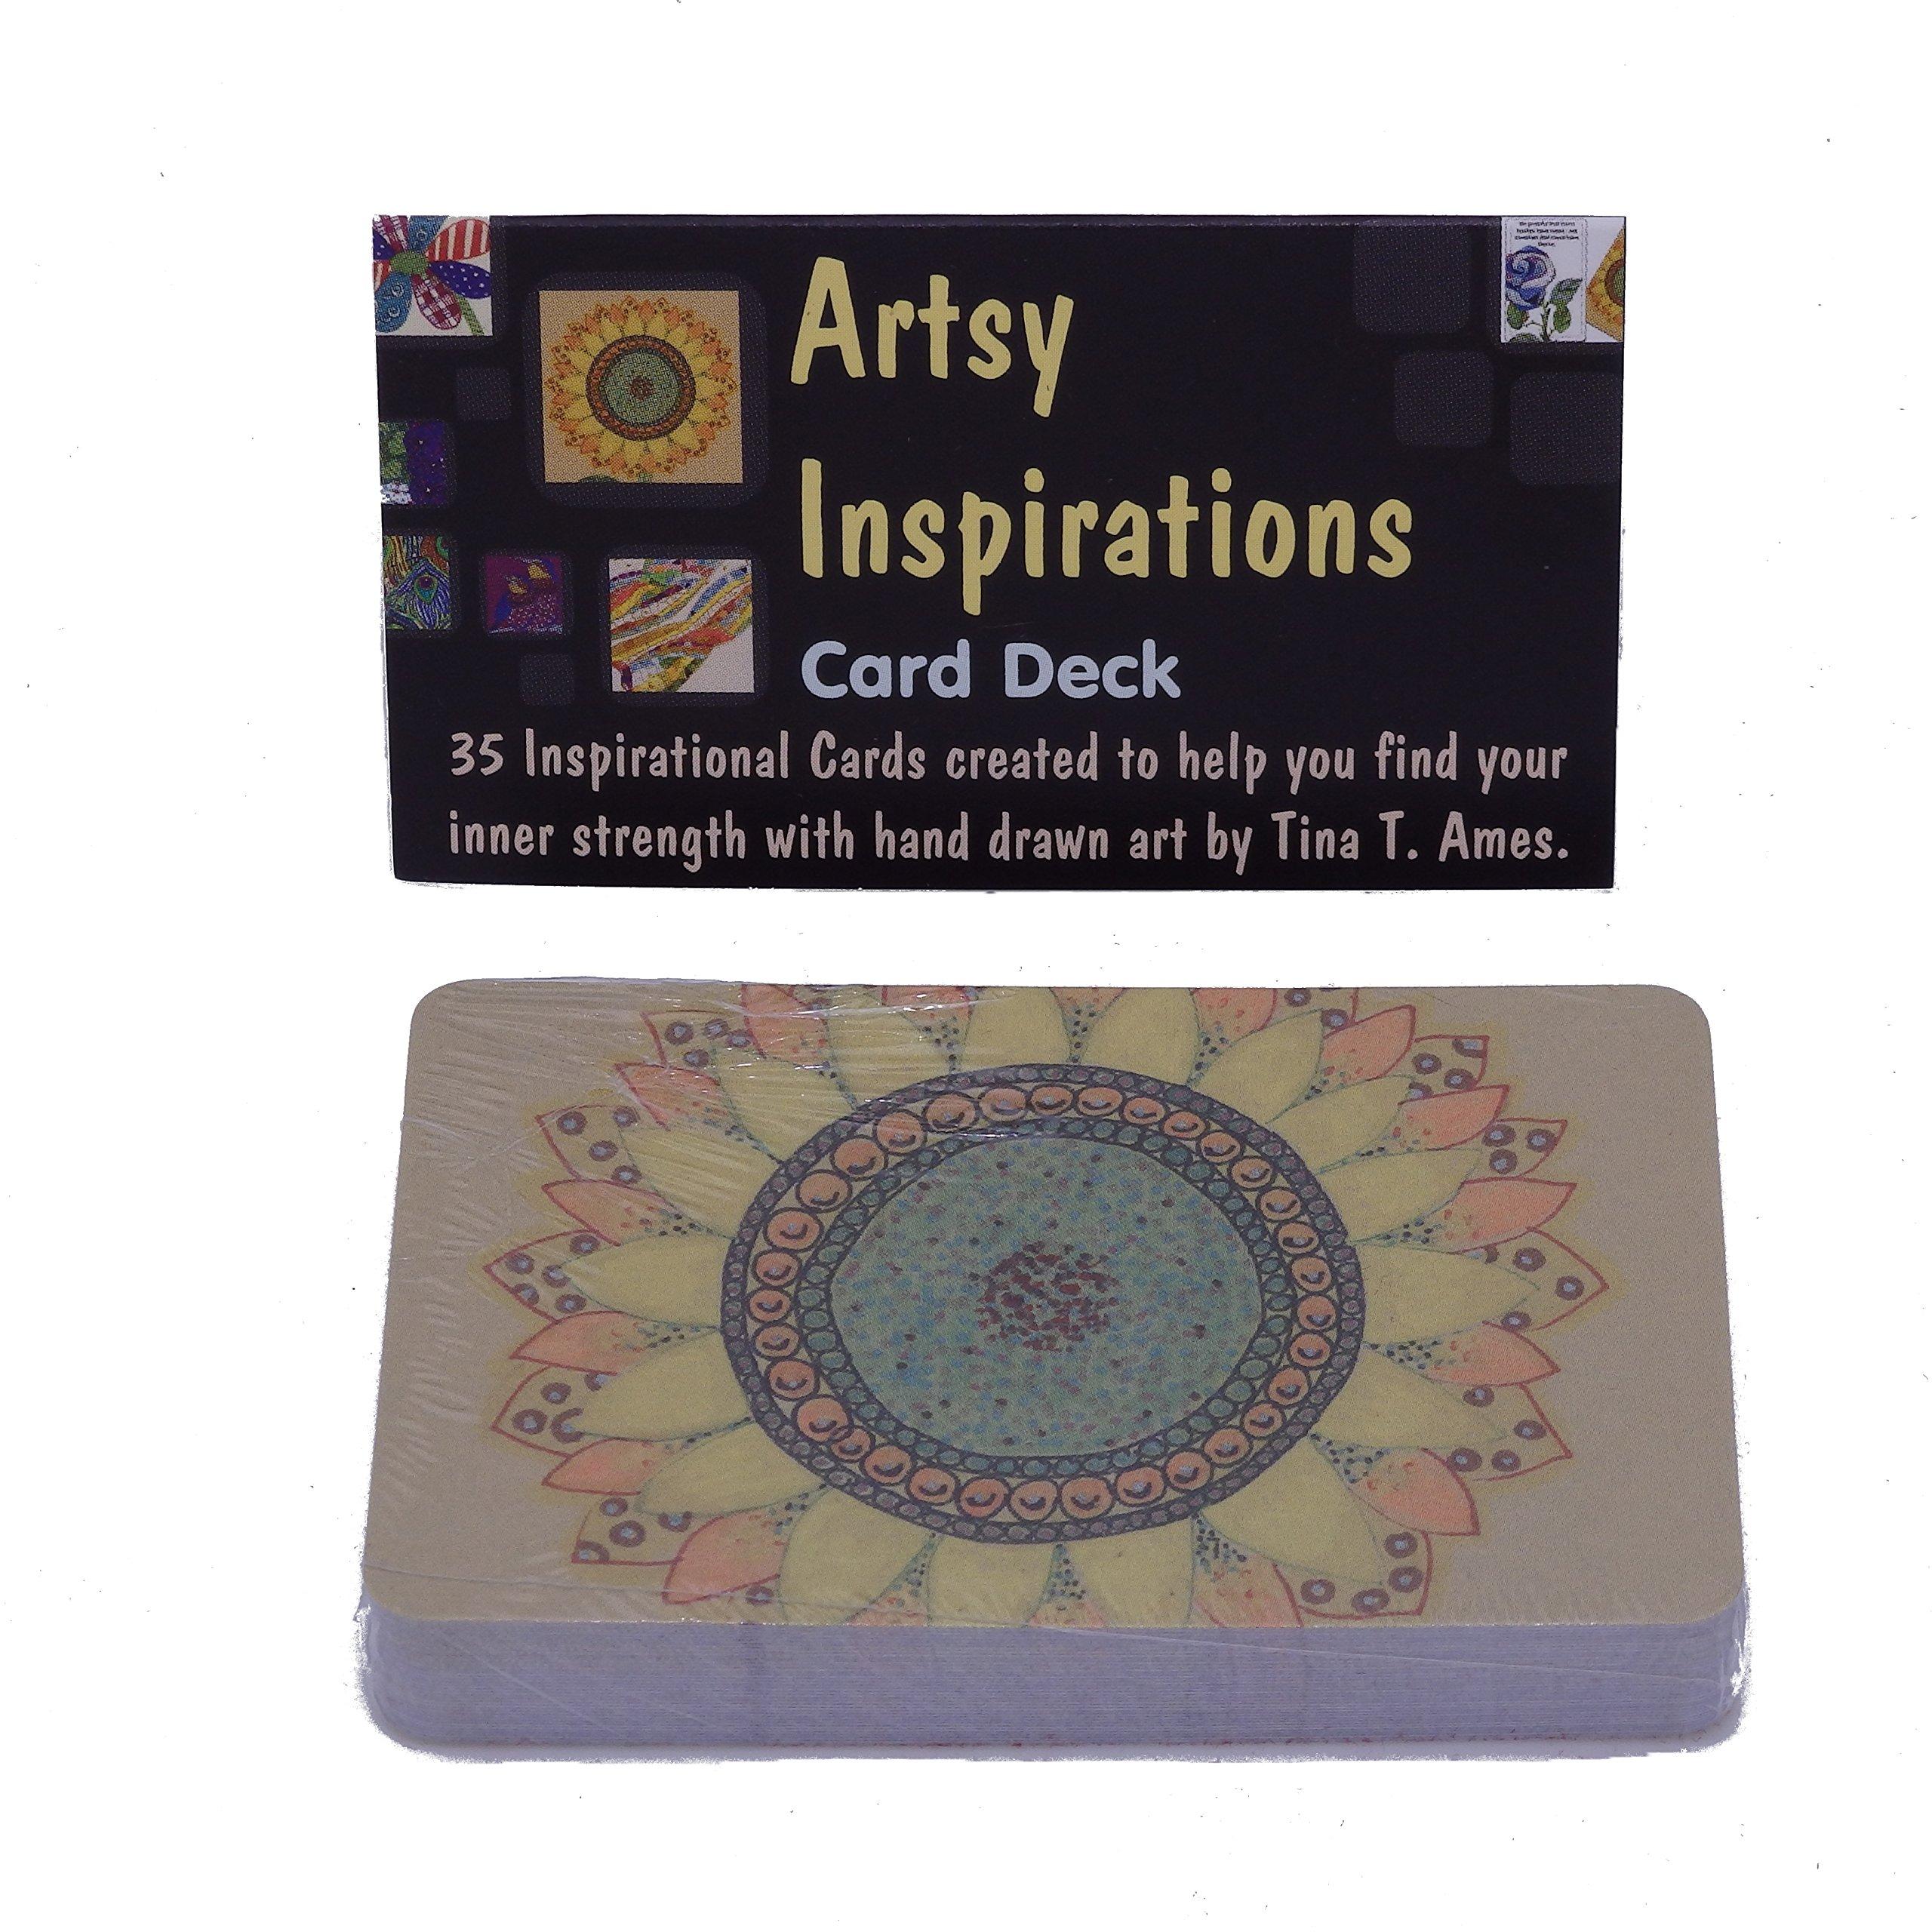 artsy inspirations card deck magically reveals advice ideas